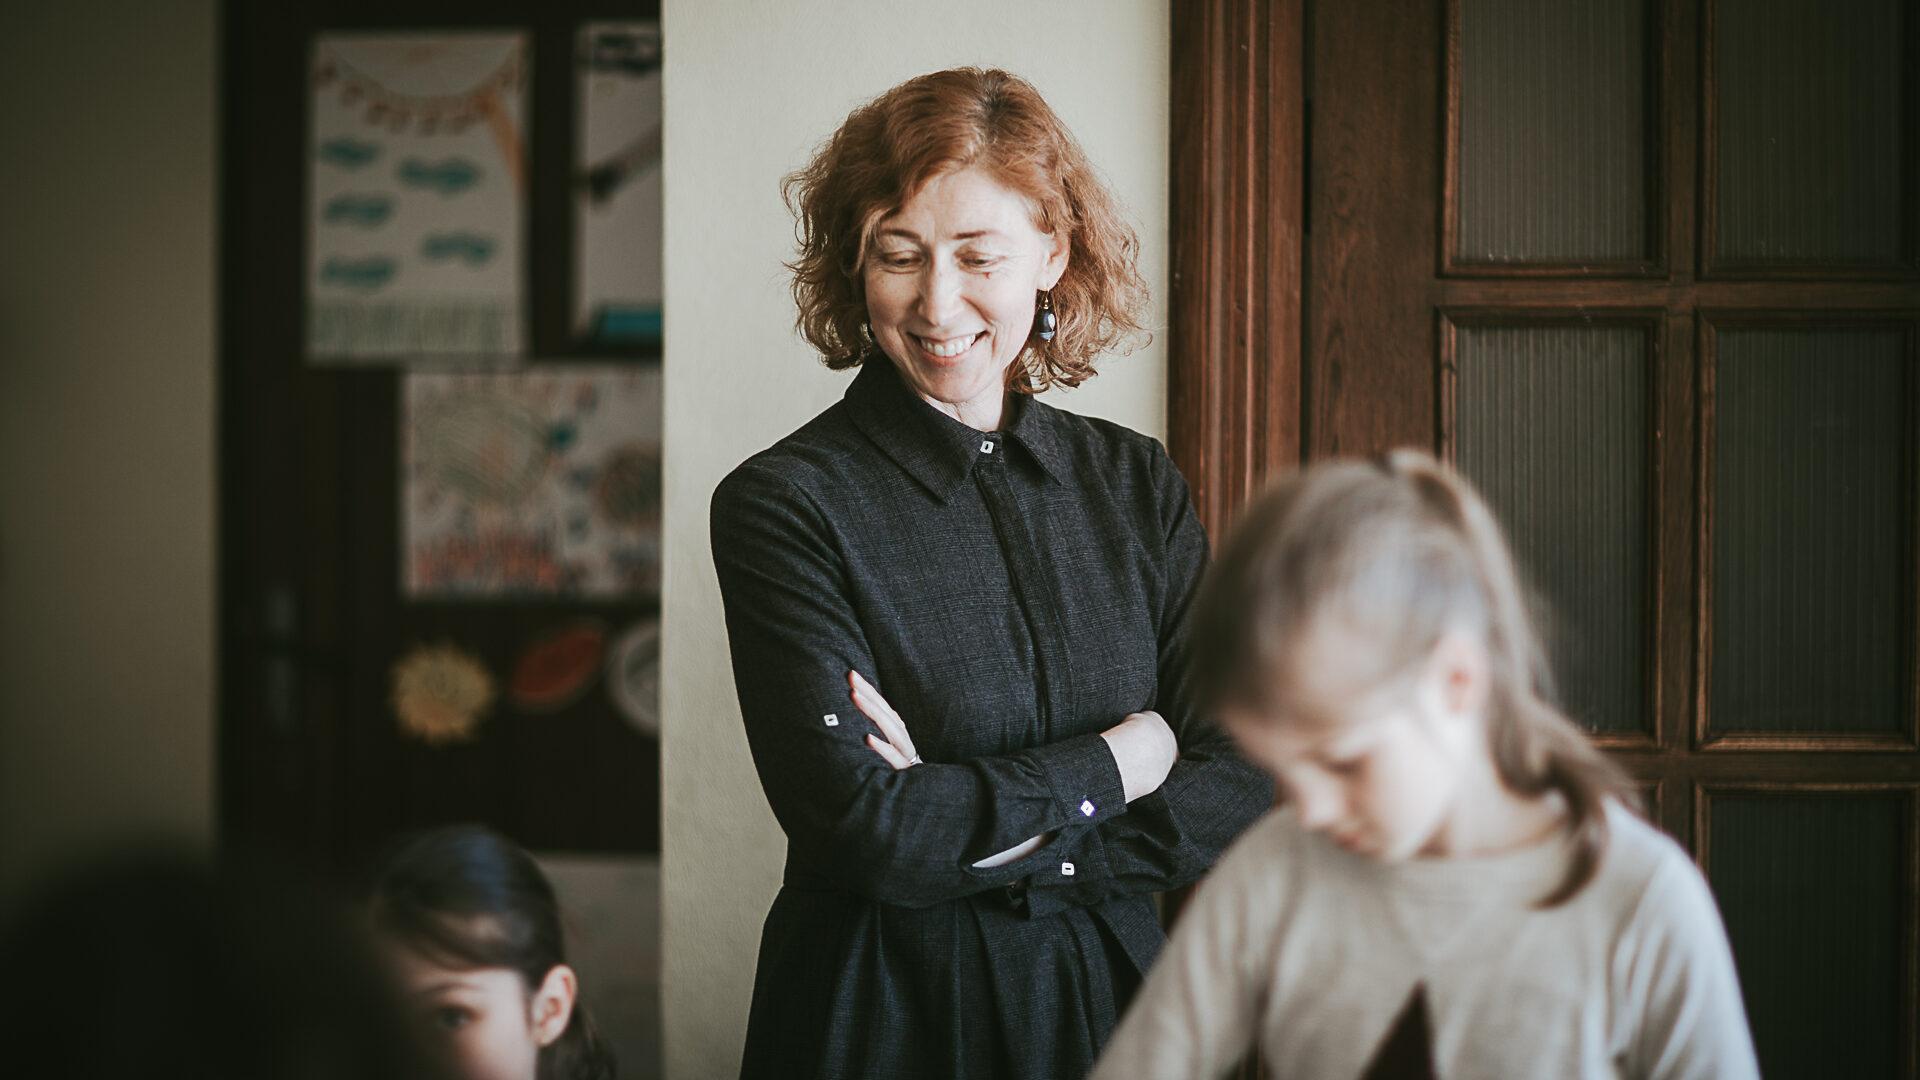 Jolita Udrienė